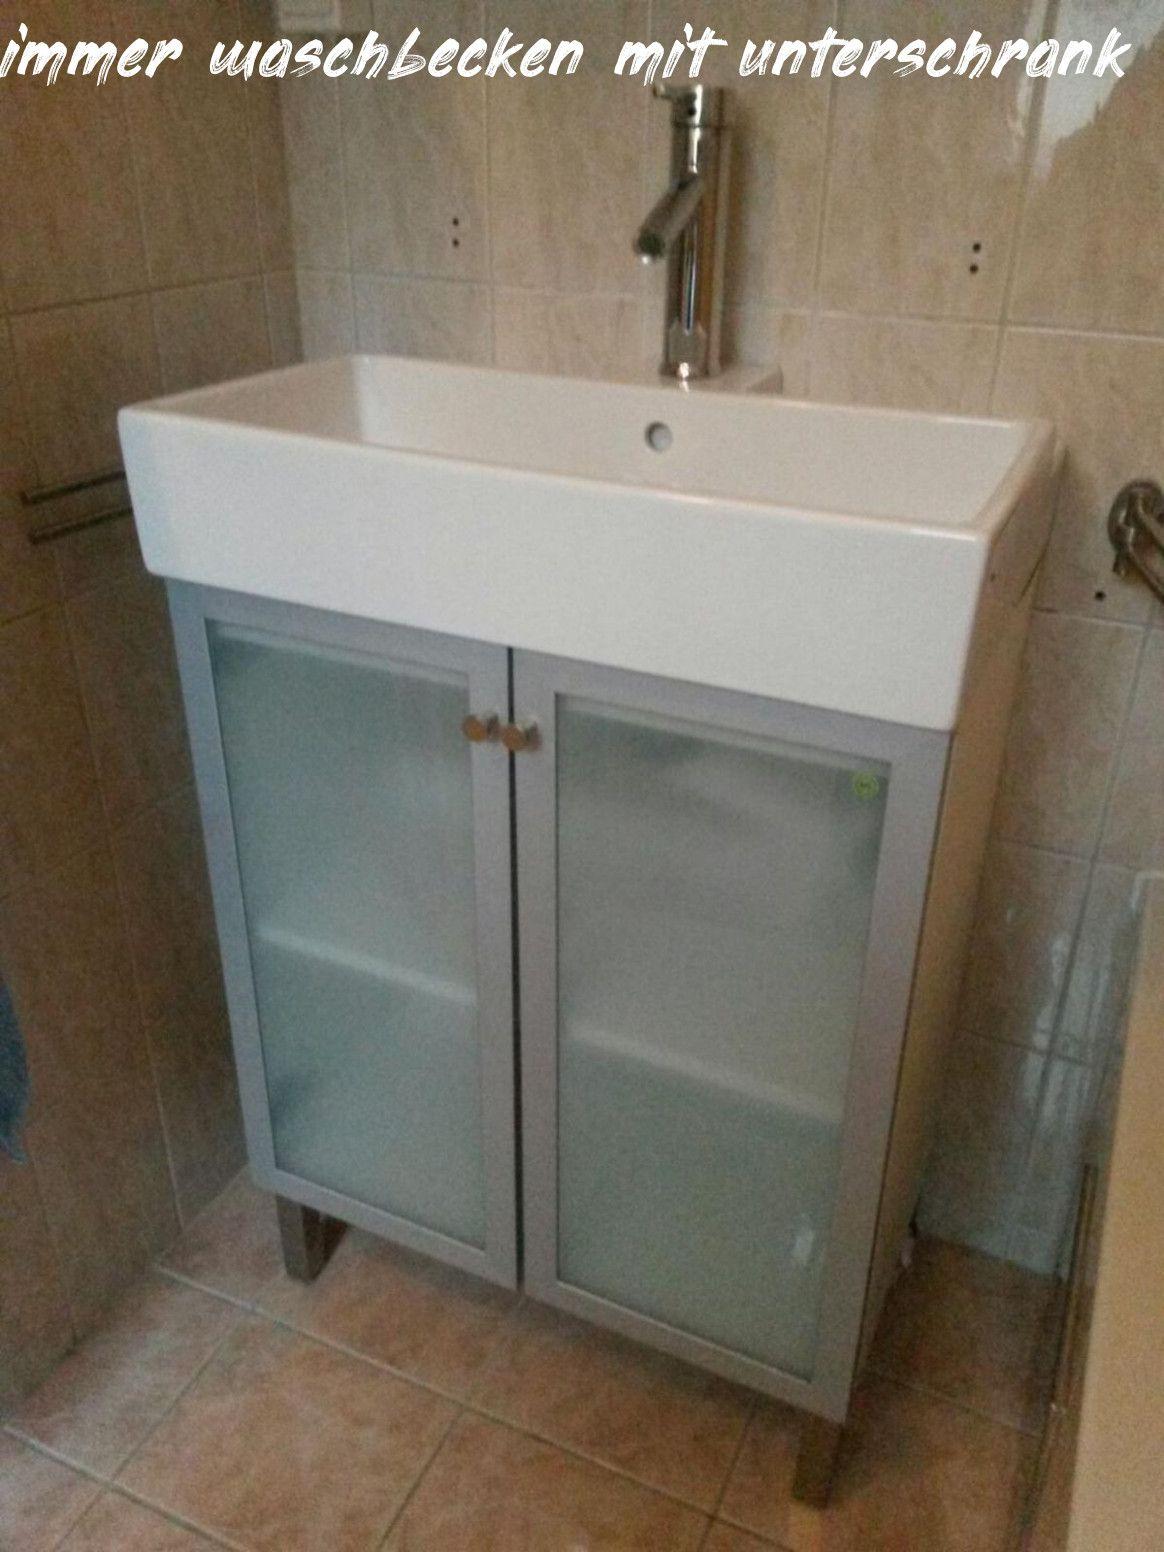 9 Ikea Badezimmer Waschbecken Mit Unterschrank In 2020 Bathroom Vanity House Plans Vanity